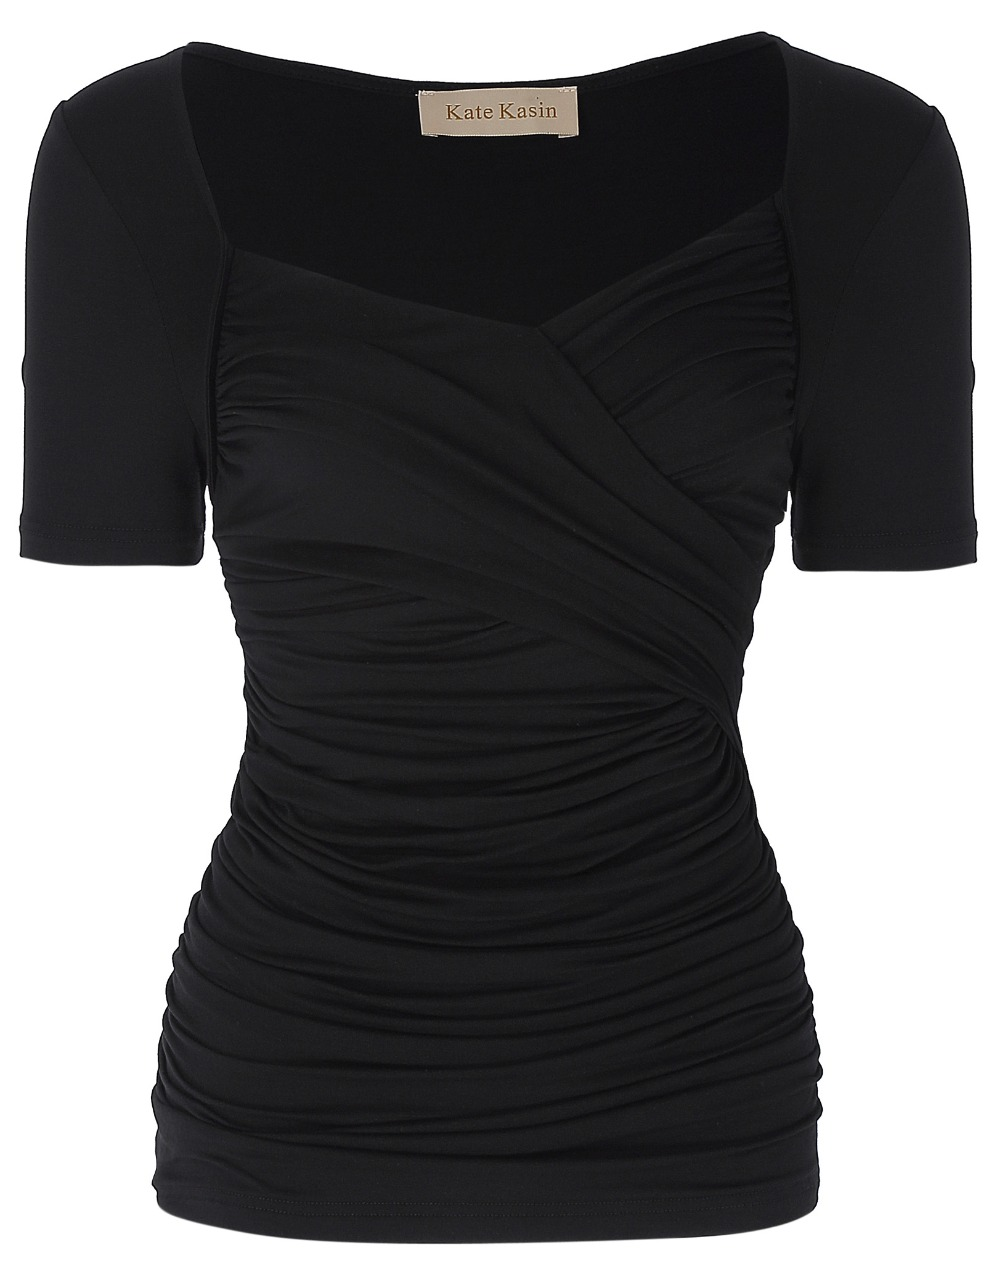 146eeb7a7 New Fashion Slim T Shirt Women Square Neck Short Sleeve Cross Front ...